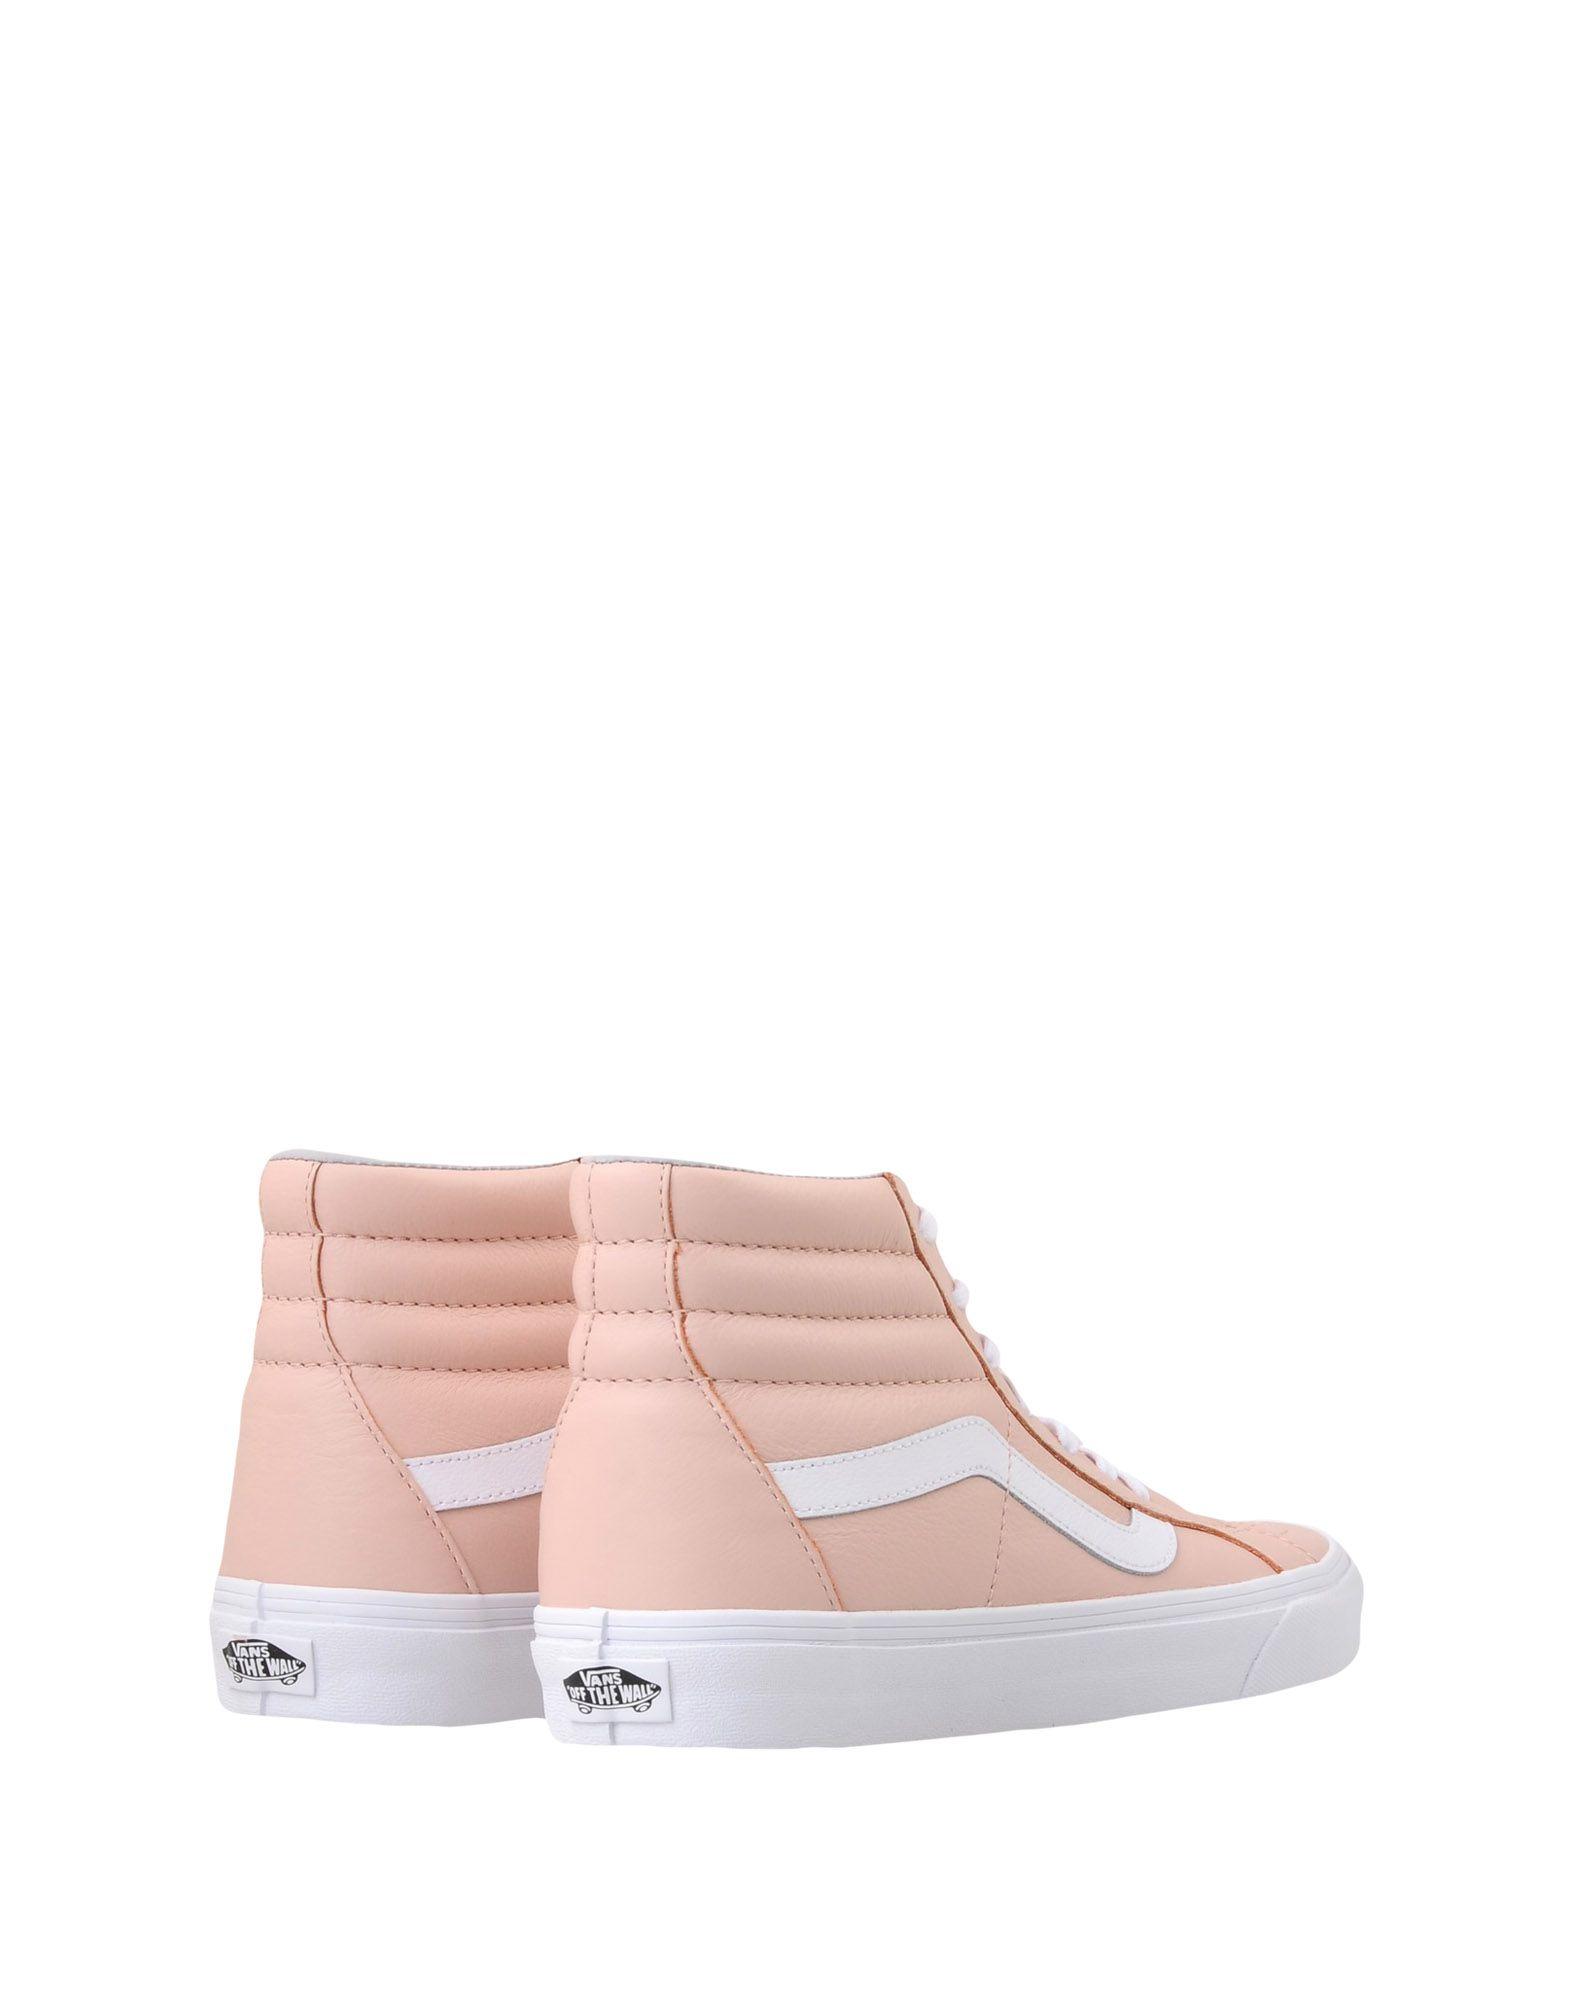 Haltbare Mode billige Schuhe Vans Neue Ua Sk8 11452059HJ Neue Vans Schuhe f186a9